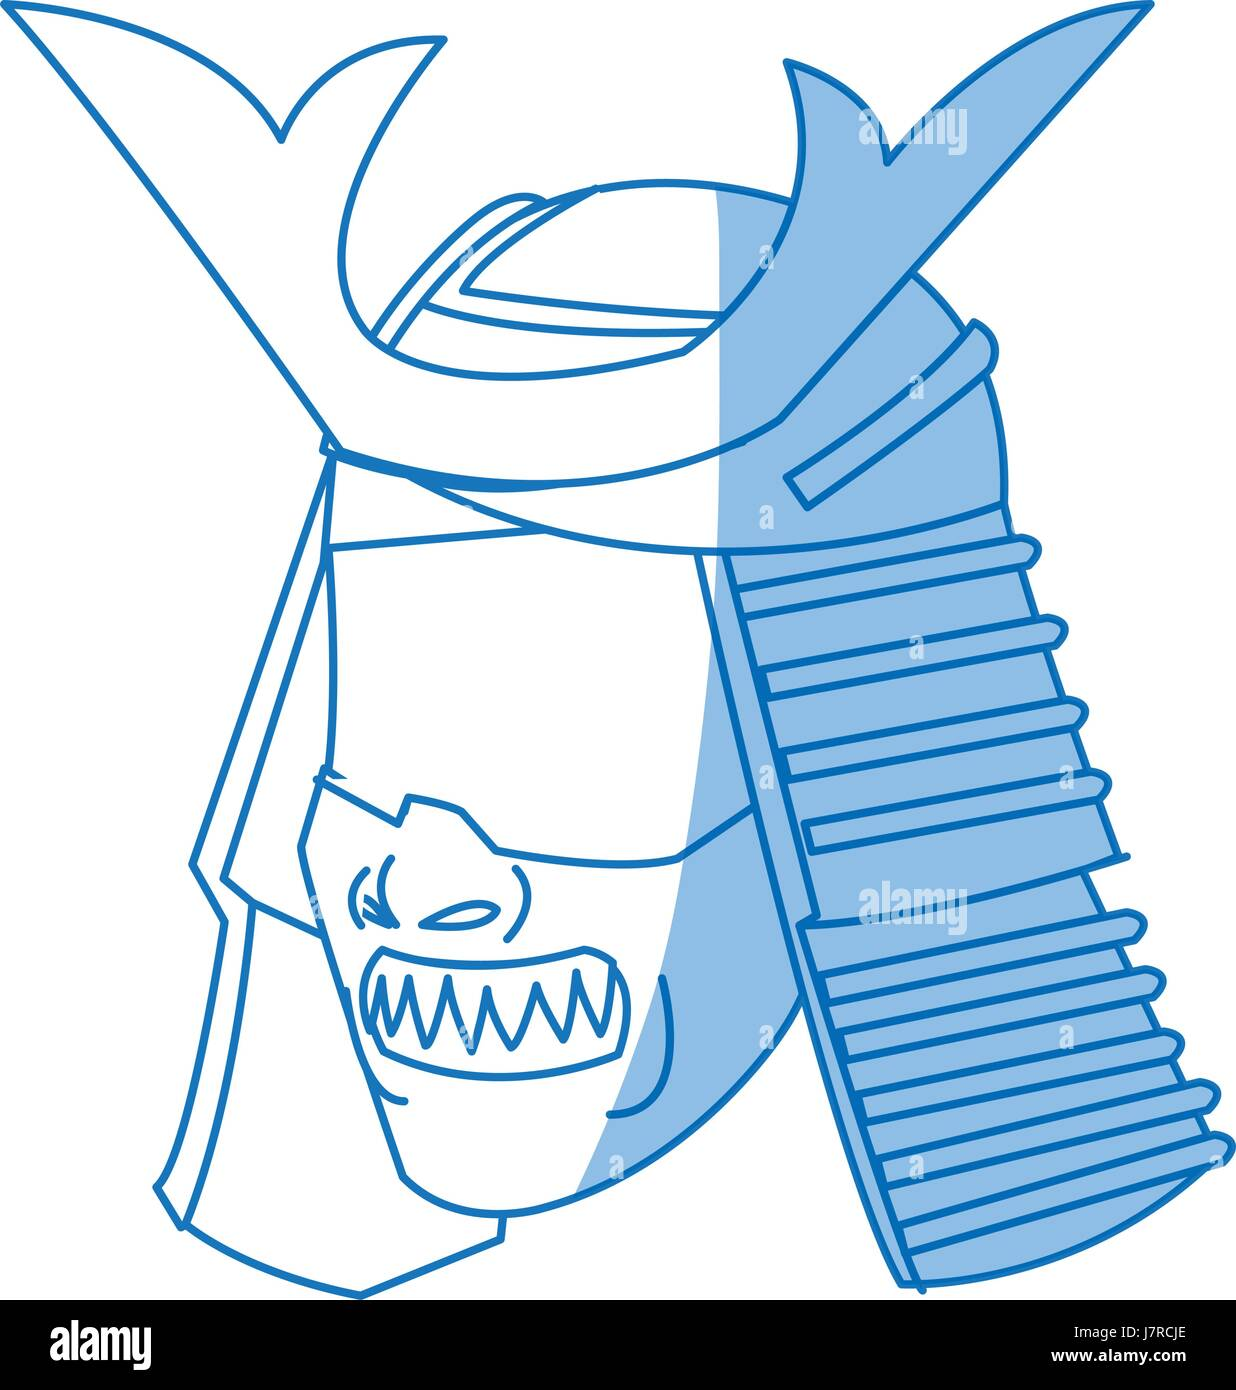 fearsome samurai mask culture japanese - Stock Image